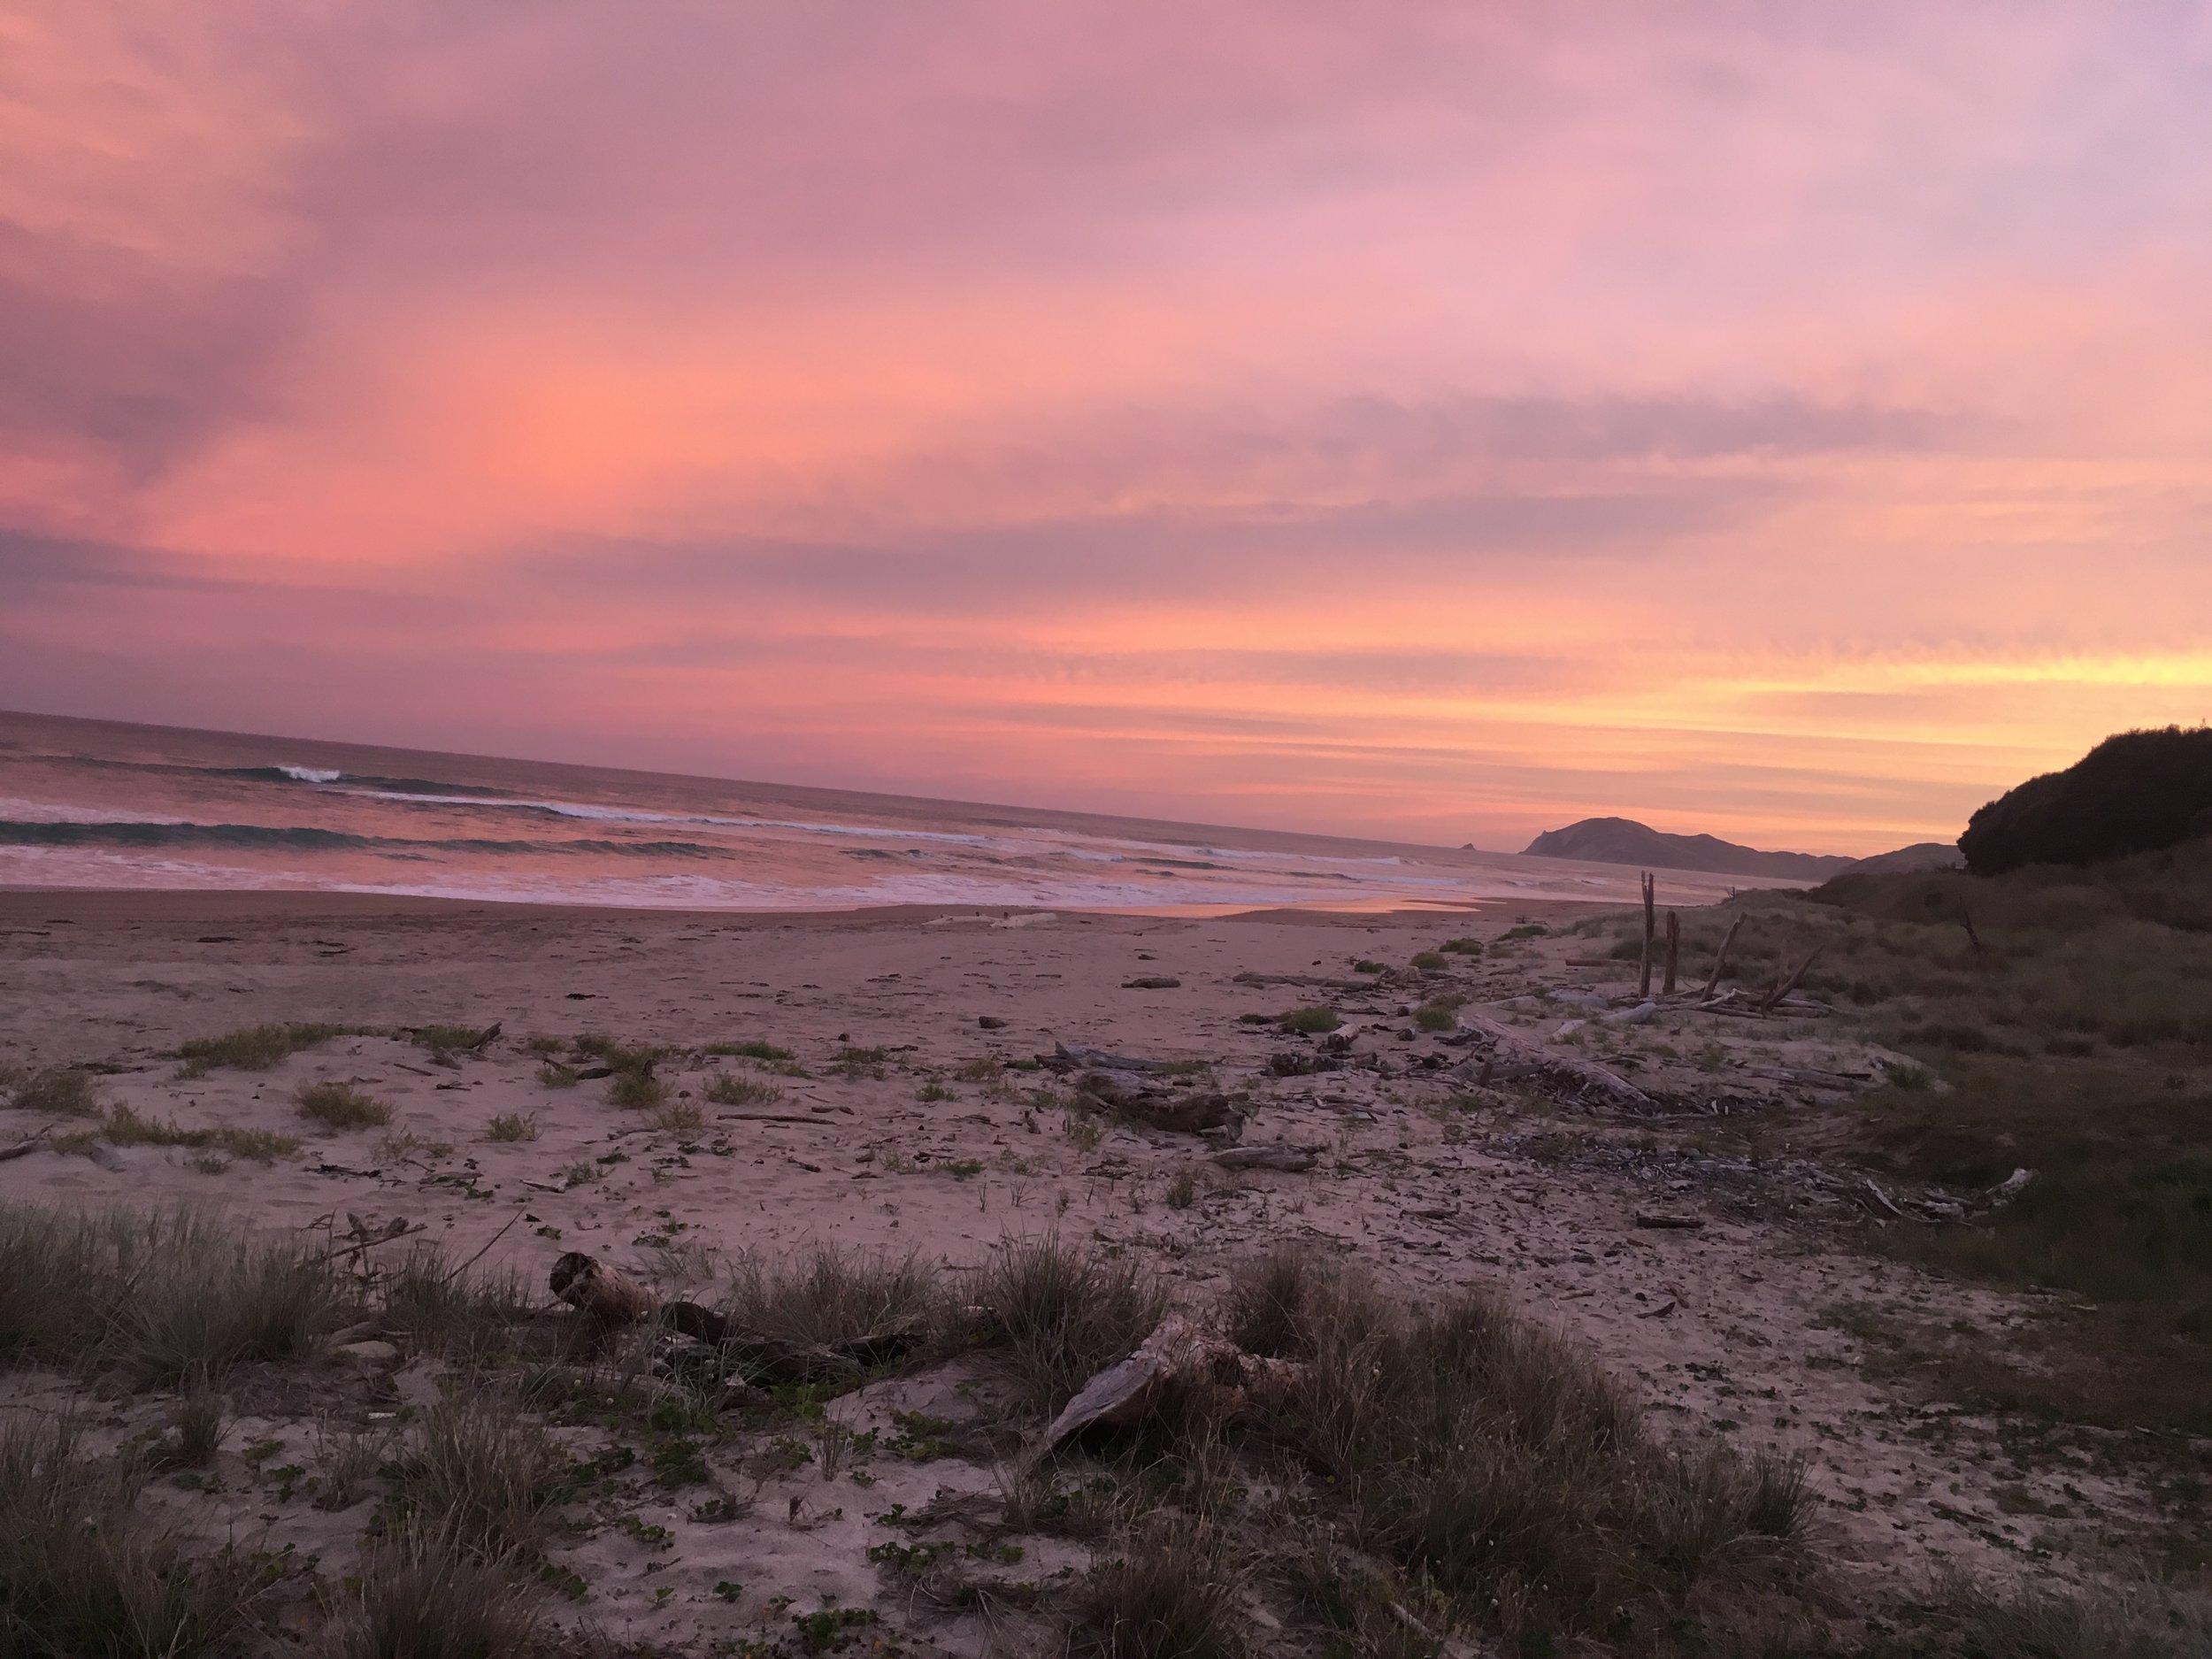 Sunset at Loisels Beach